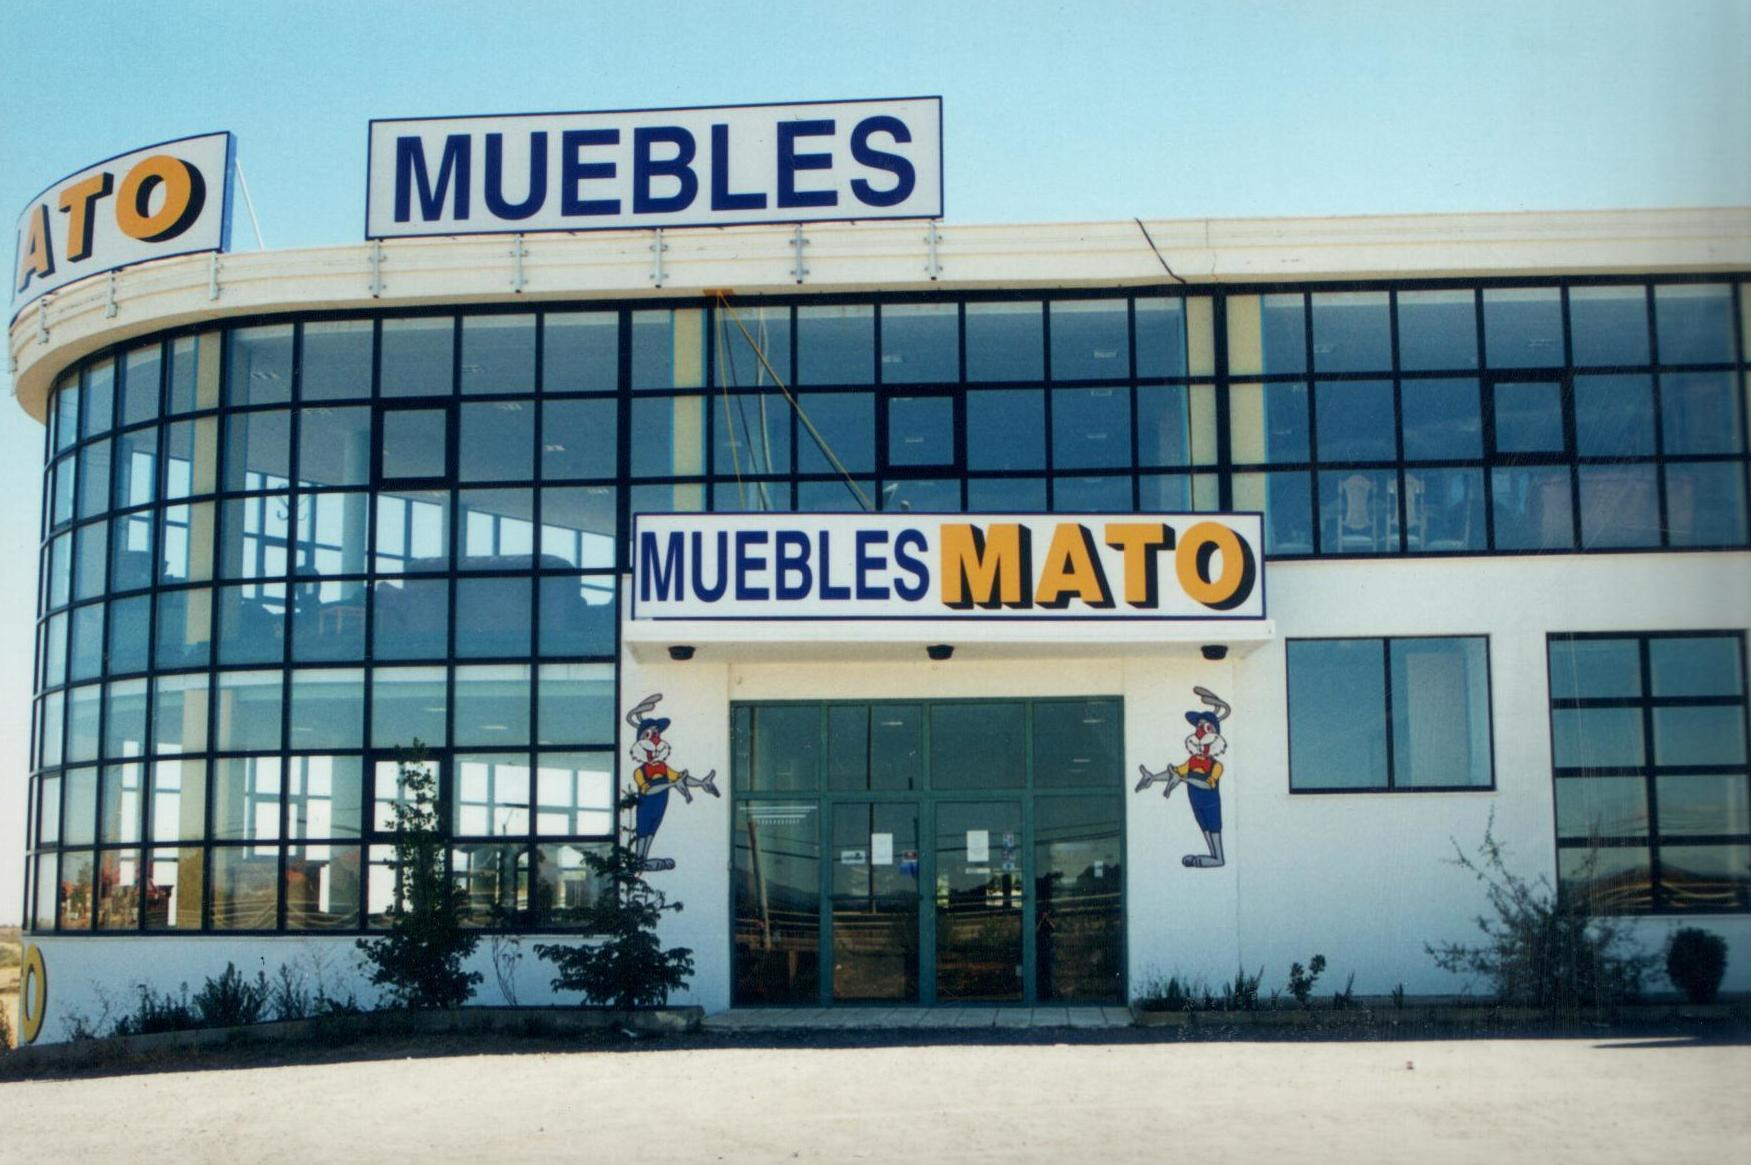 Muebles baratos en asturias perfect tags with muebles for Muebles super economicos